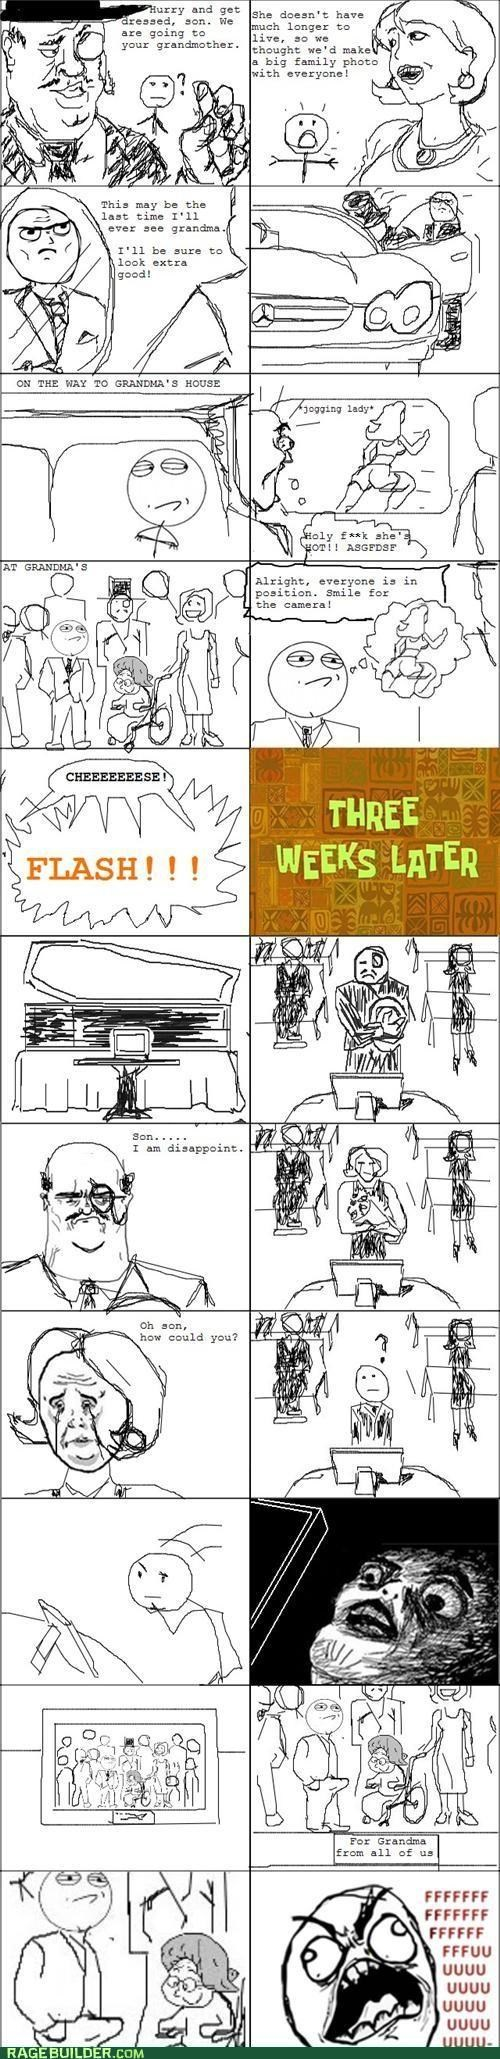 Awkward best of week family photo hand drawn Rage Comics - 5410047232